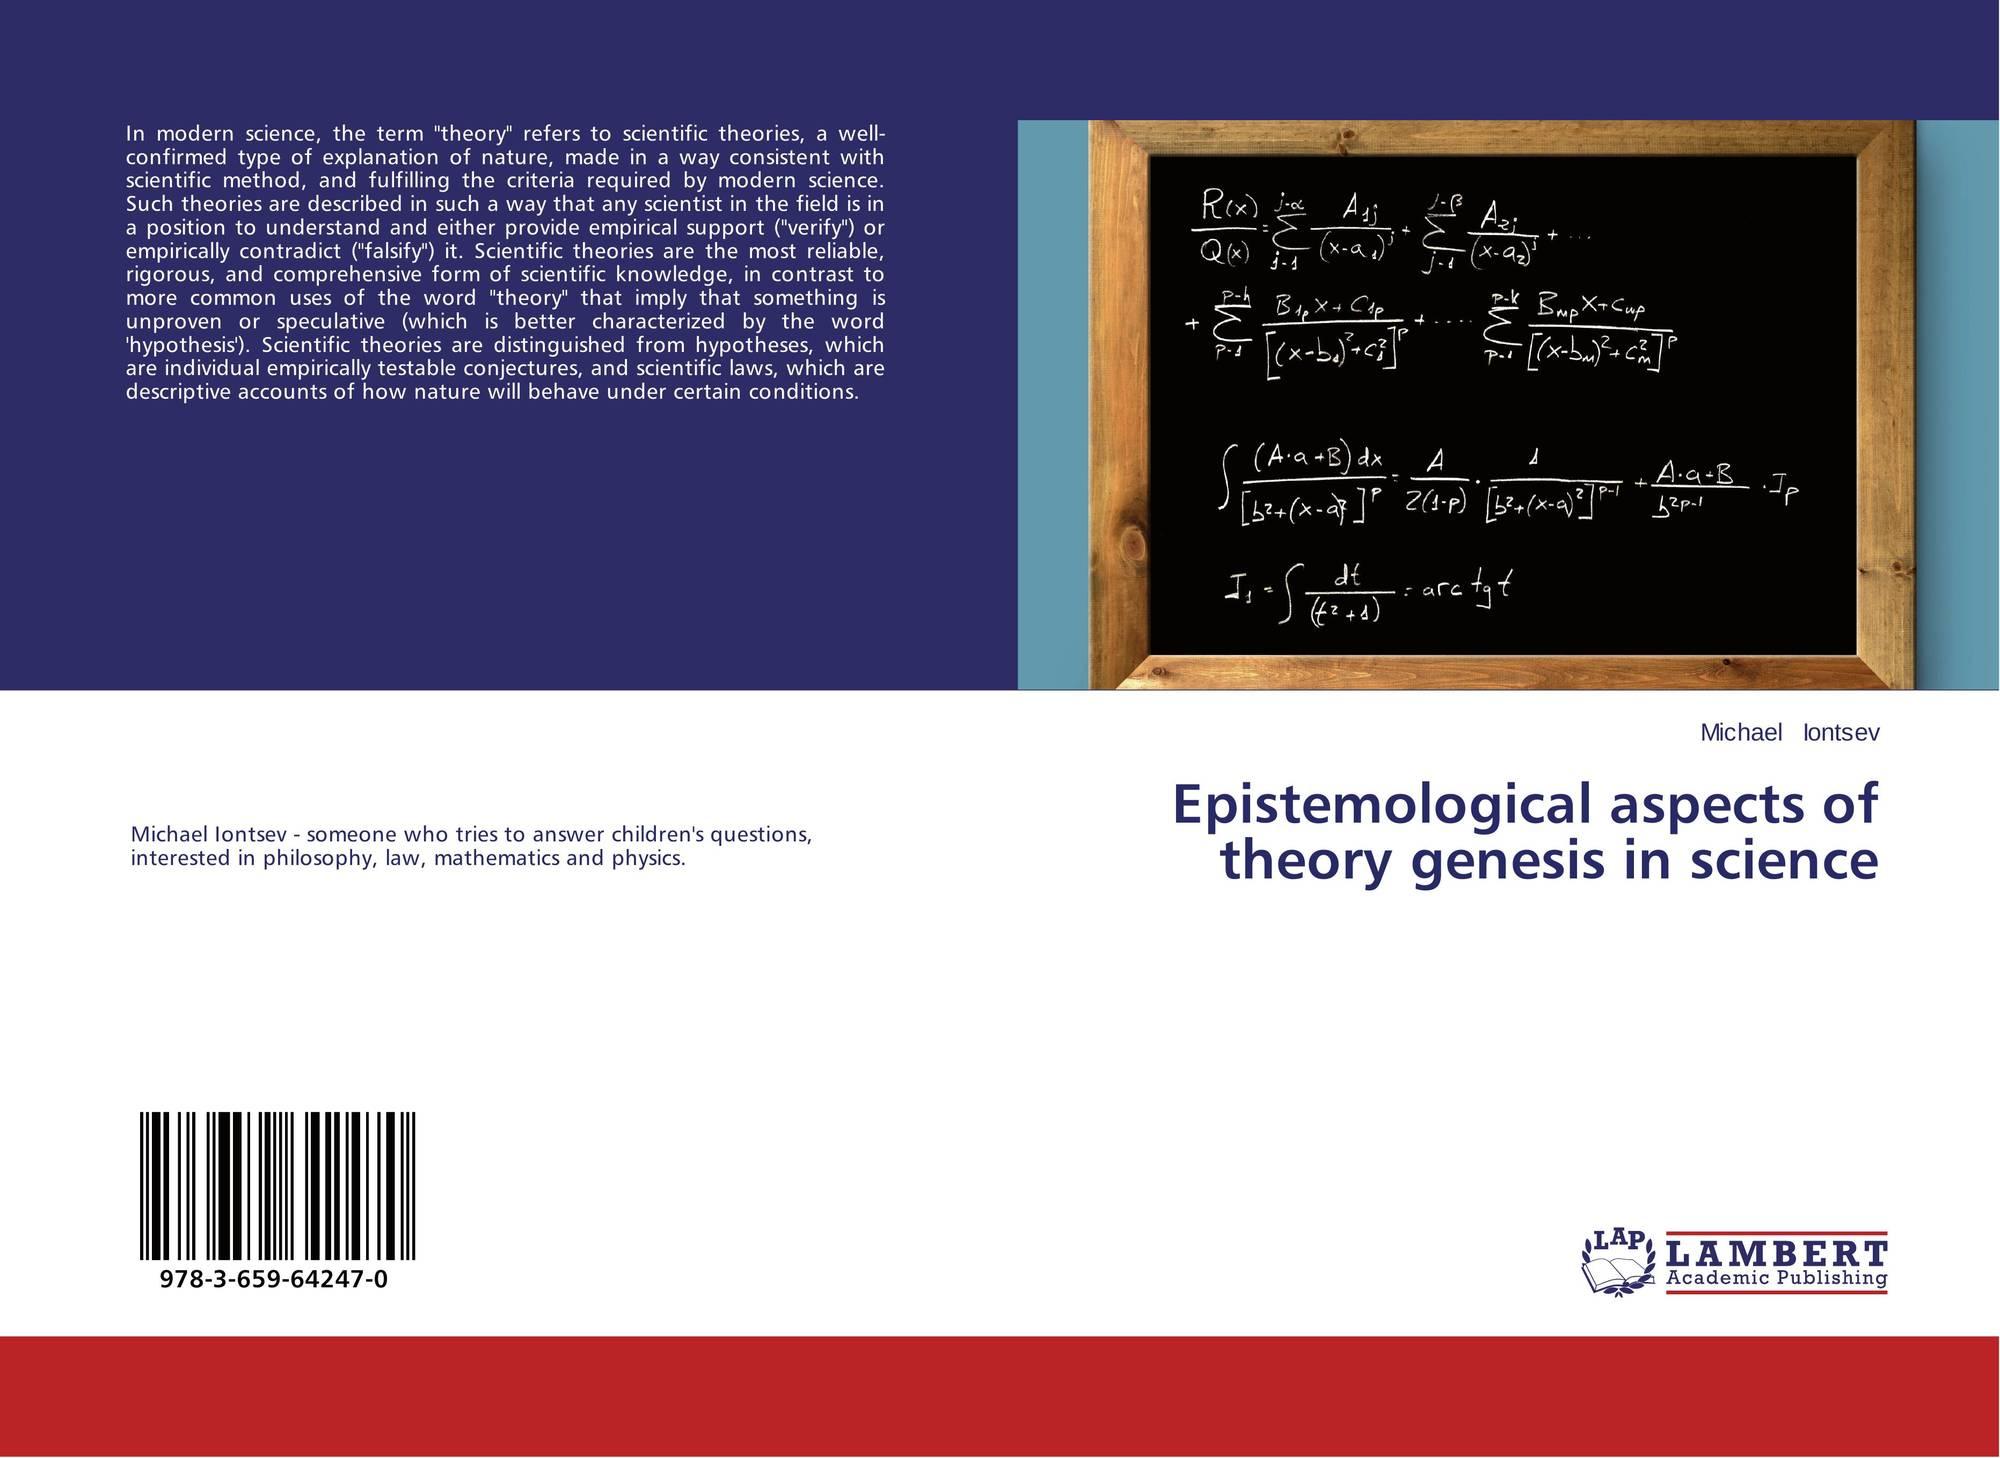 ebook Photoelasticity: Proceedings of the International Symposium on Photoelasticity, Tokyo, 1986